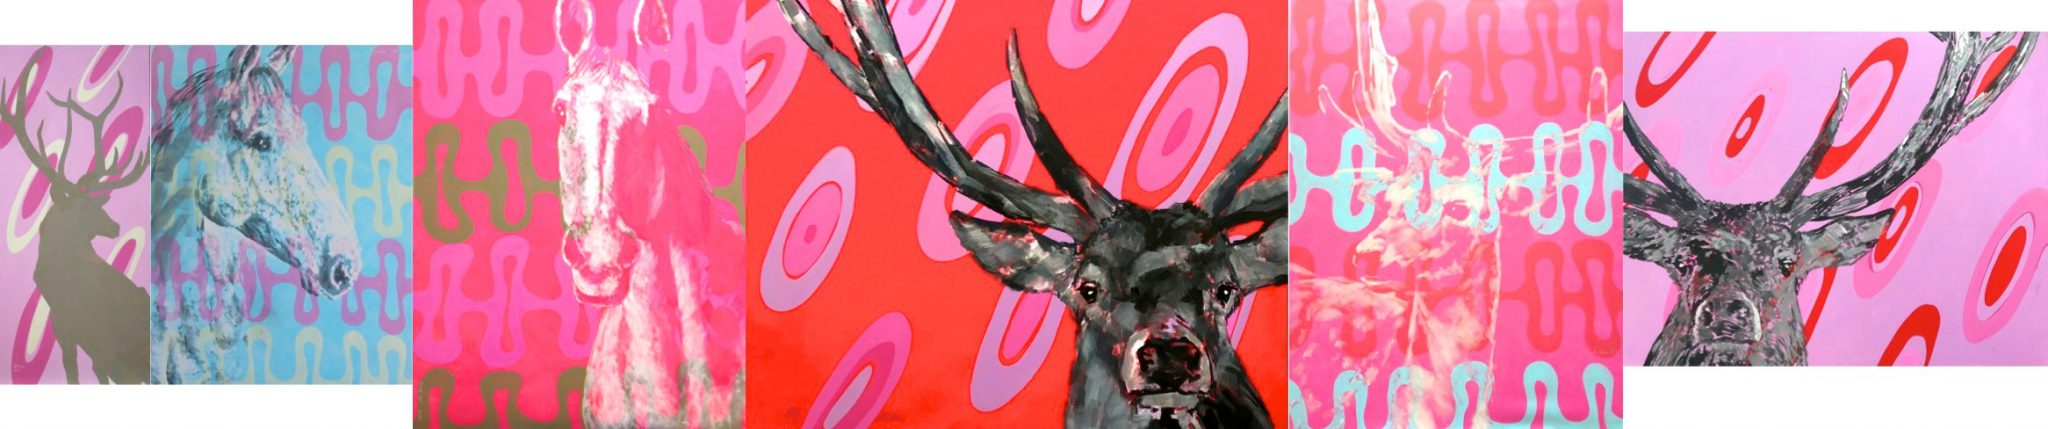 Himmelblau Rosa Ausstellung 2018 Sylt Galerie Nottbohm